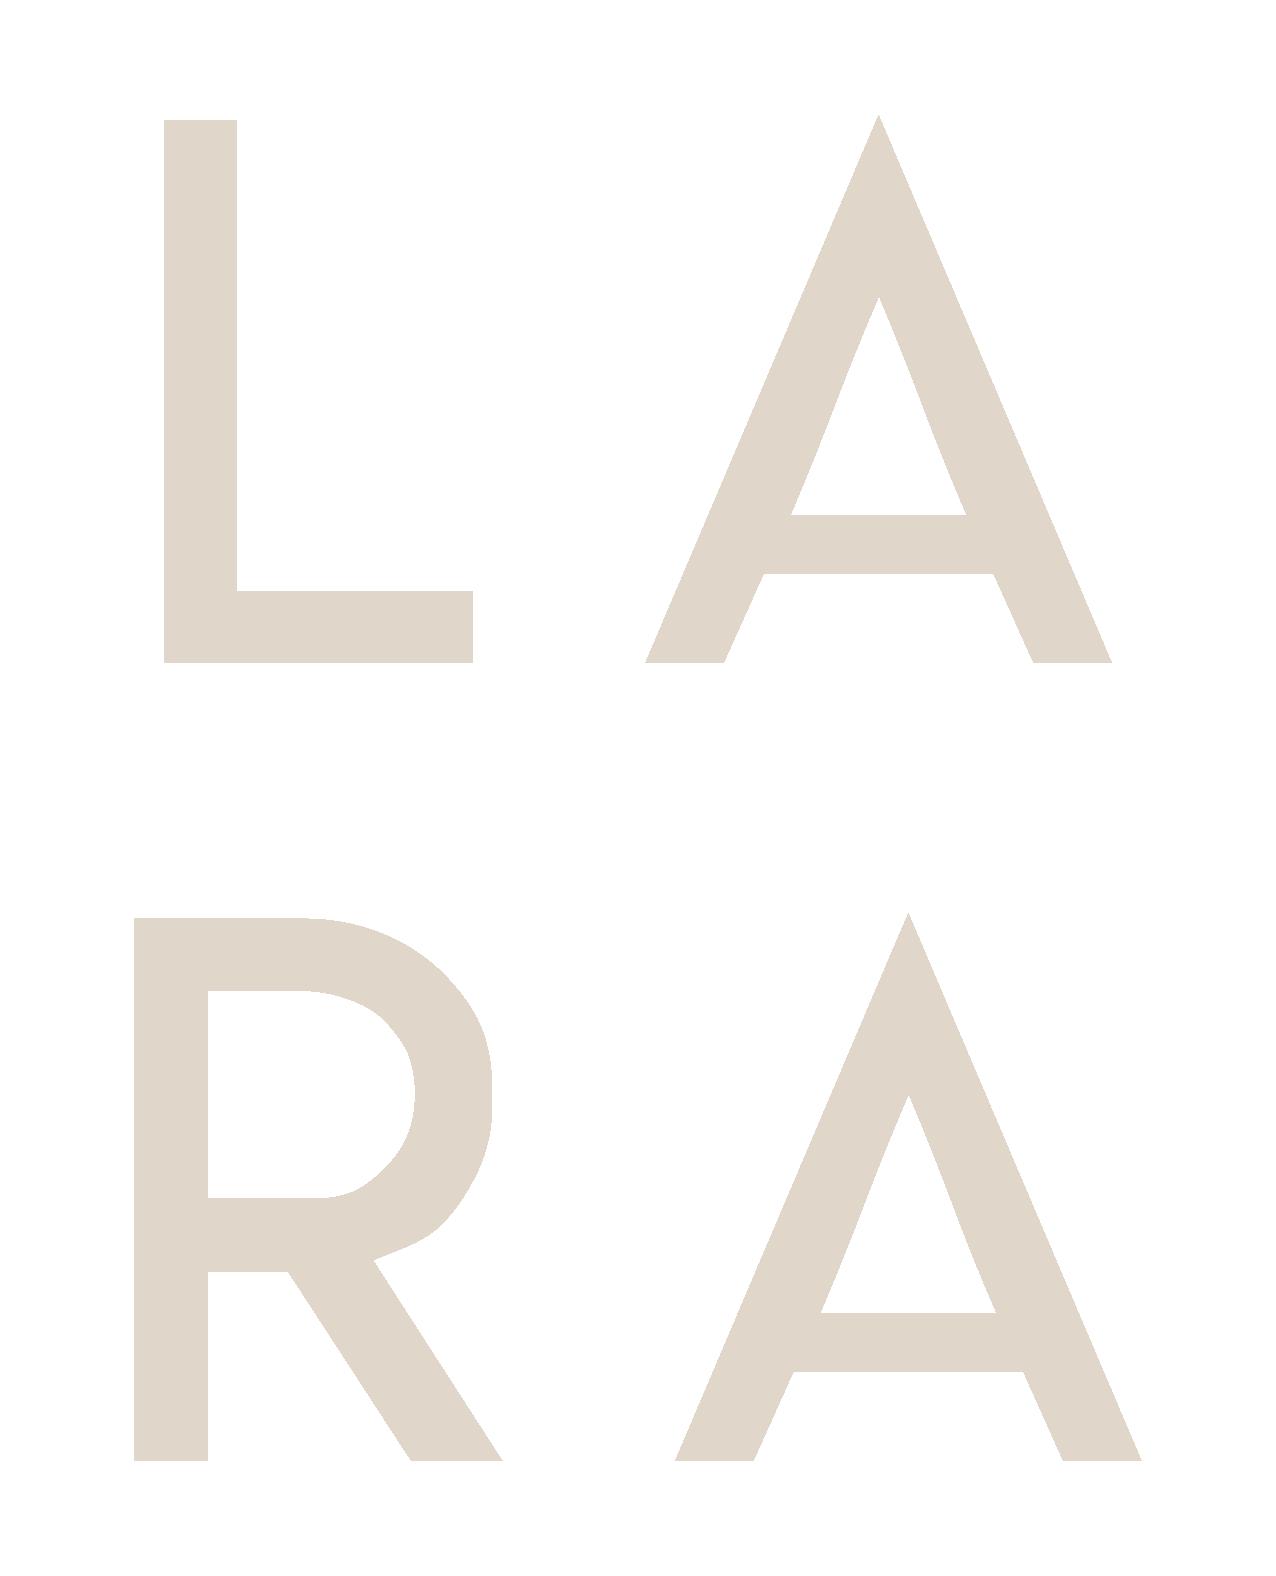 LM_Branding_LARA_Stone.png